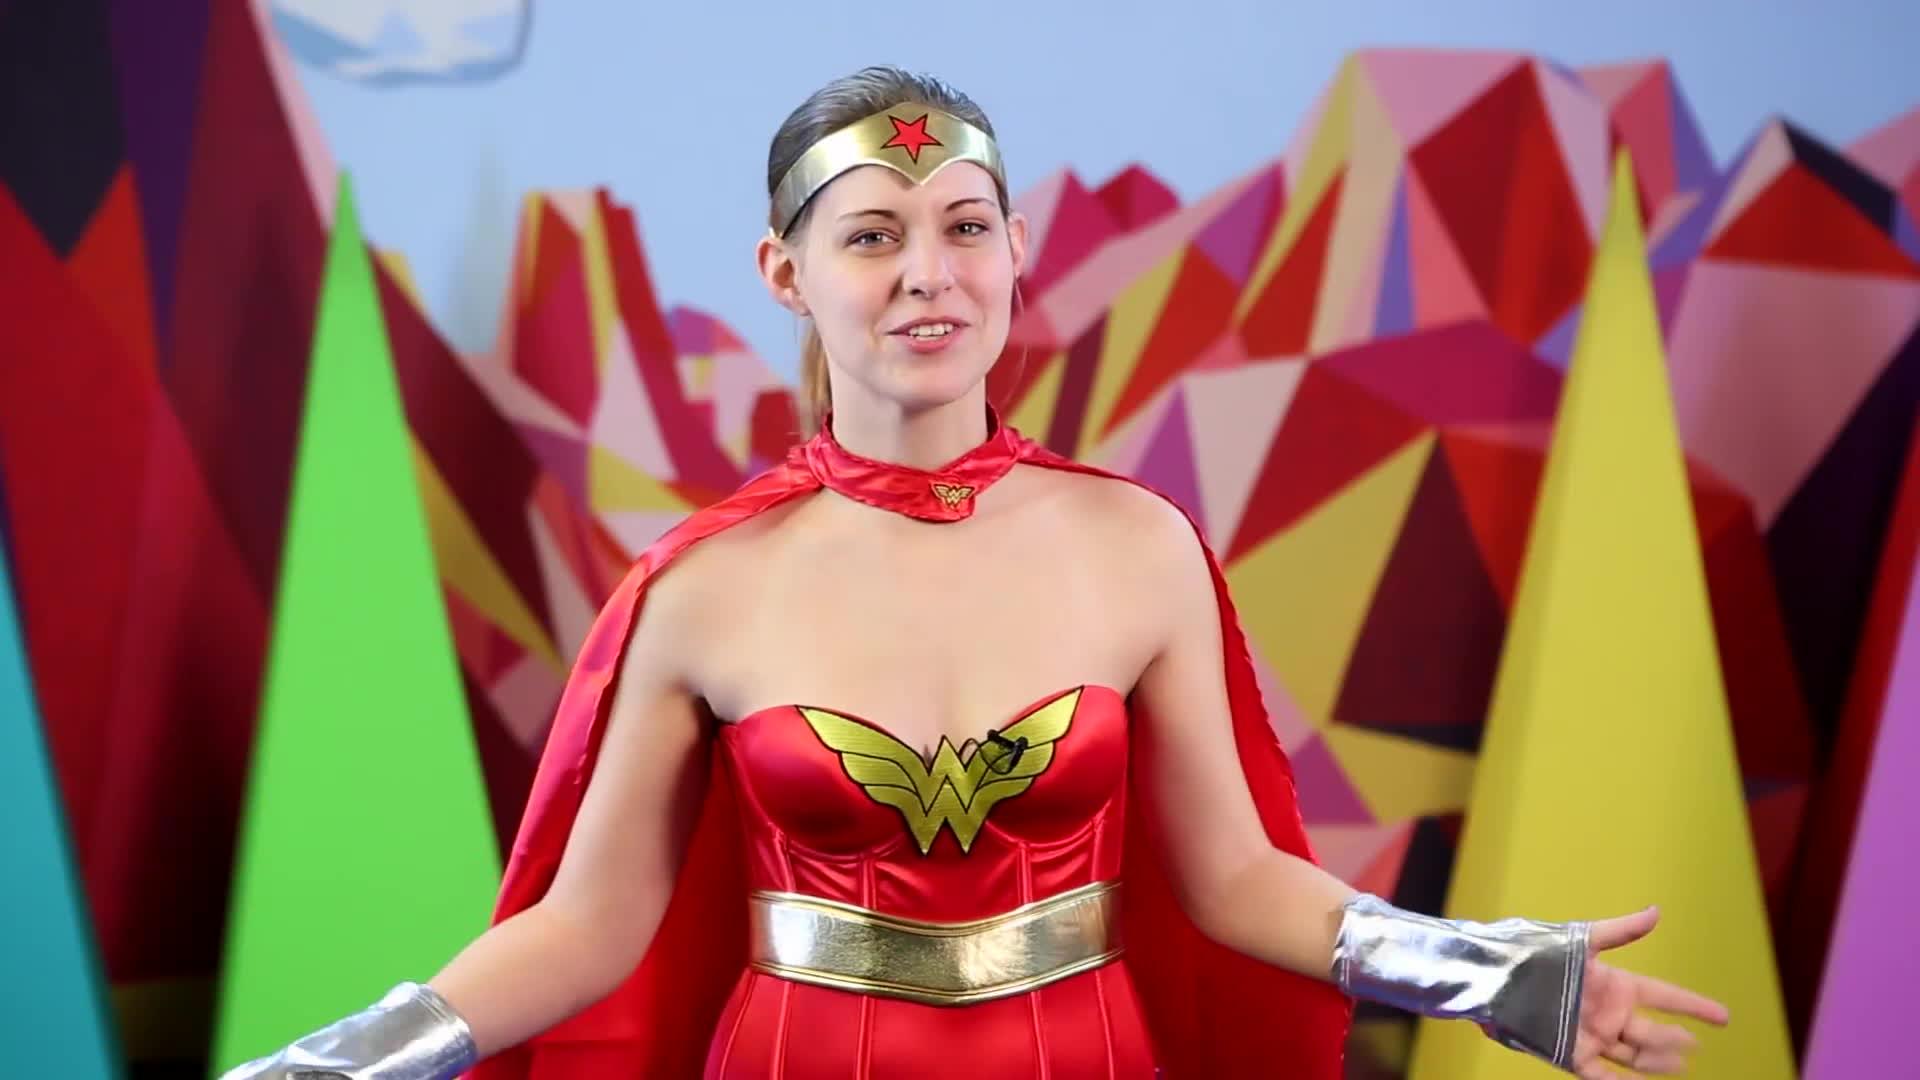 presshearttocontinue dodger, Dodger Wonder Woman GIFs